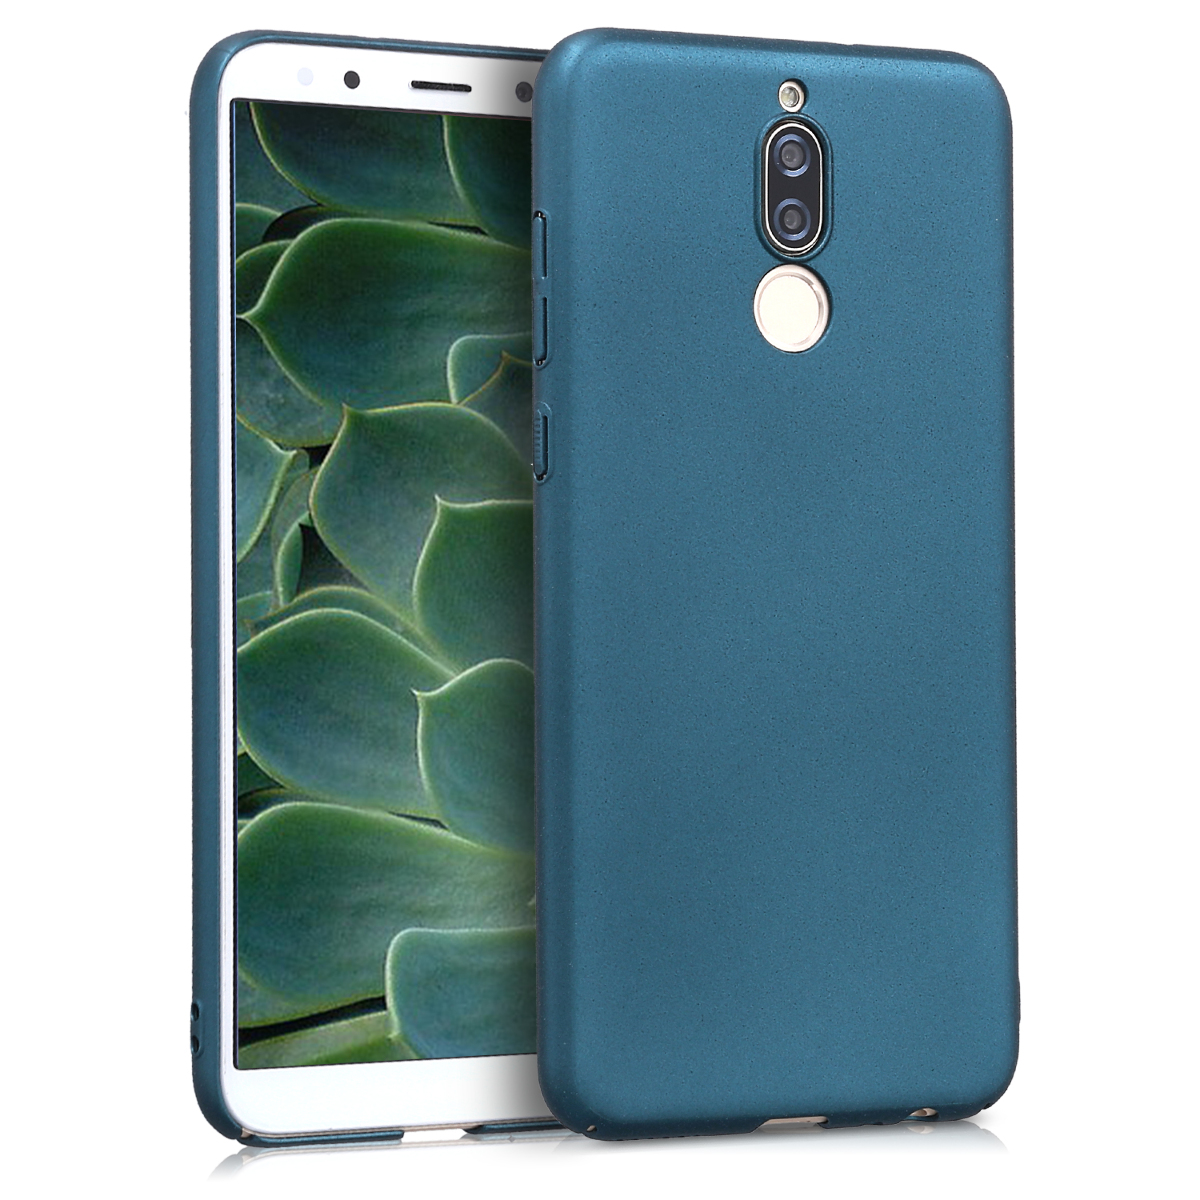 KW Slim Anti-Slip Cover - Σκληρή Θήκη Καουτσούκ Huawei Mate 10 Lite - Τυρκουάζ μεταλλικό (45019.14)